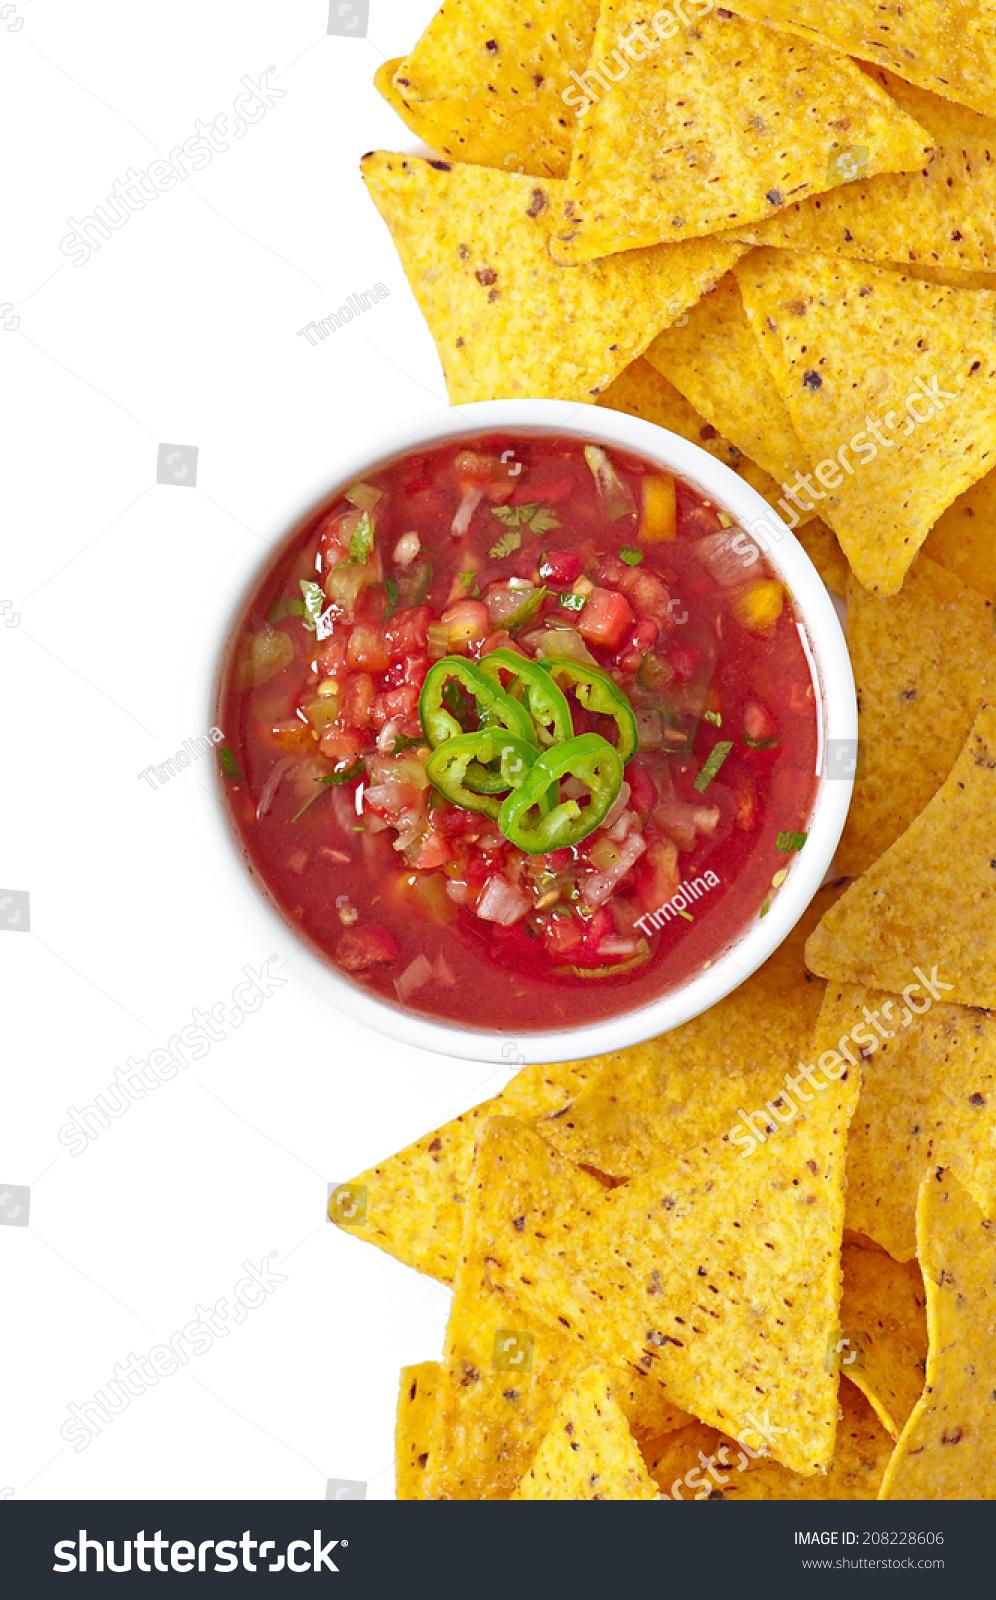 how to make fresh salsa dip